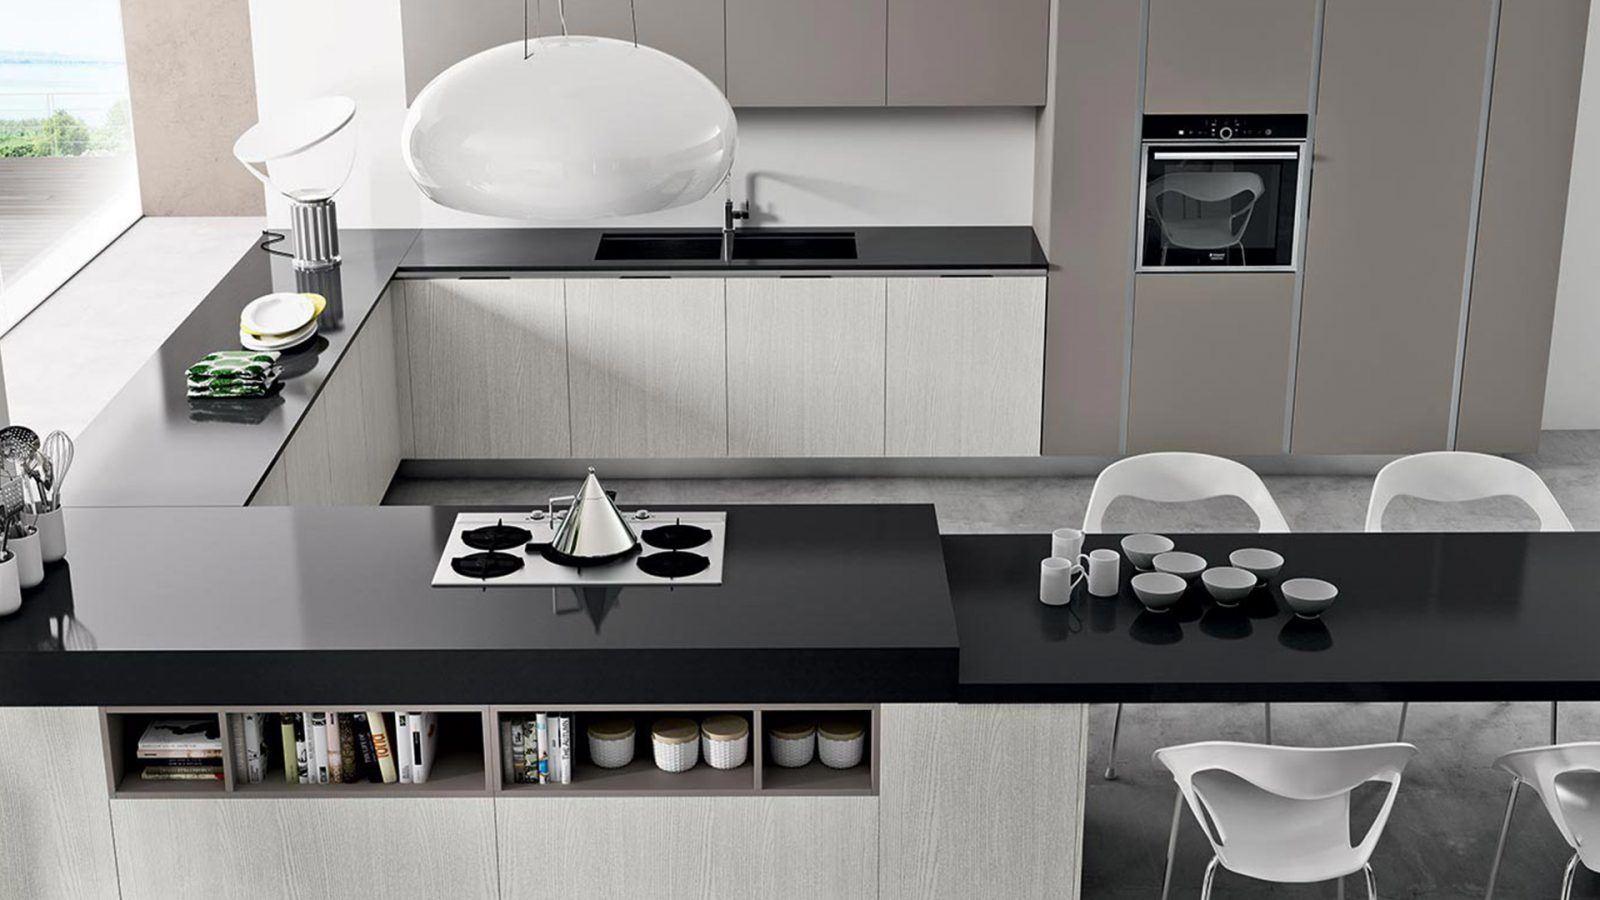 Cucine di design moderno e contemporaneo a padova - Cucina moderna design ...